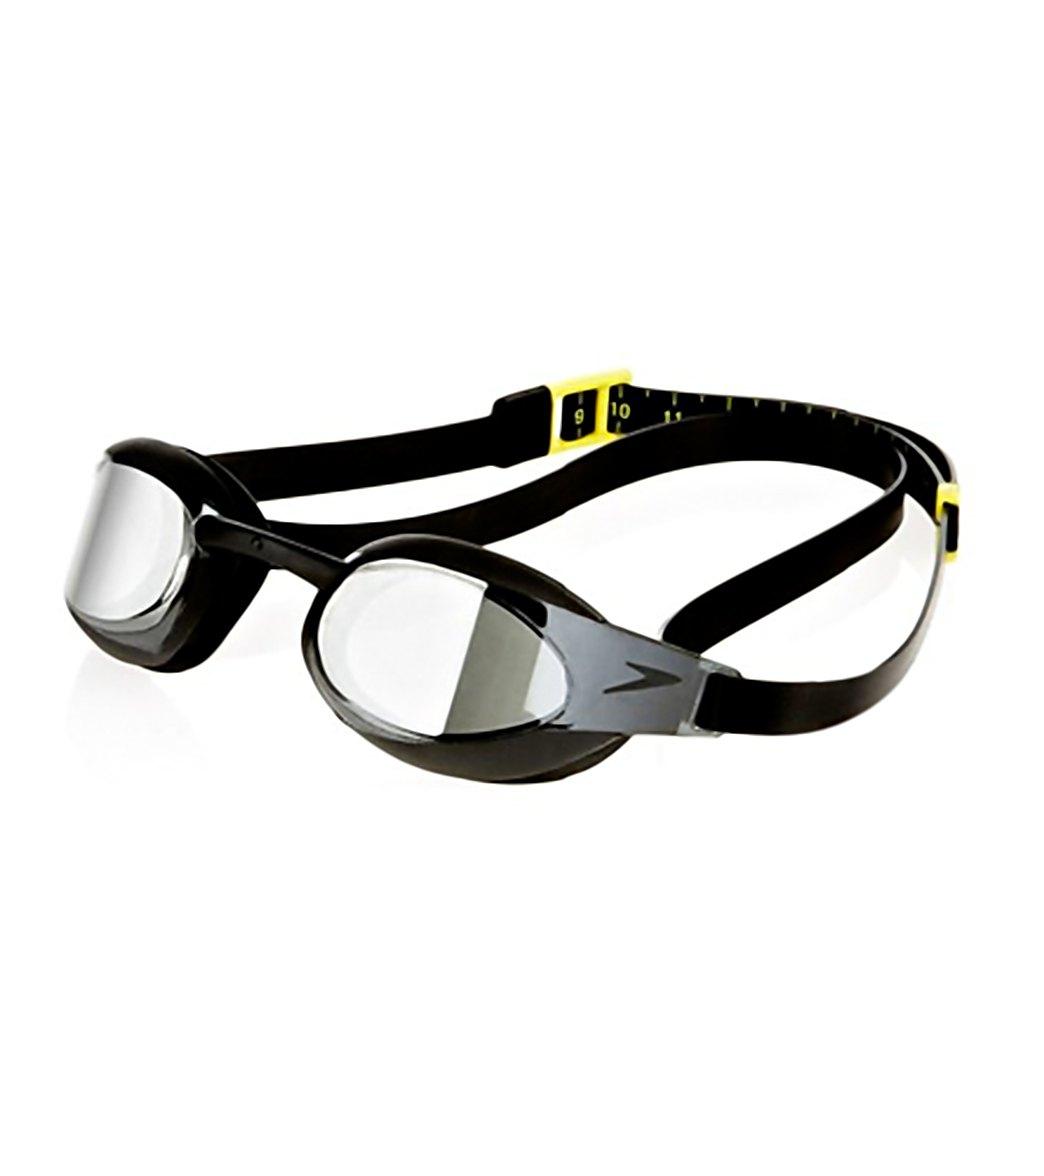 Speedo Fastskin3 Elite Mirrored Competition Goggles